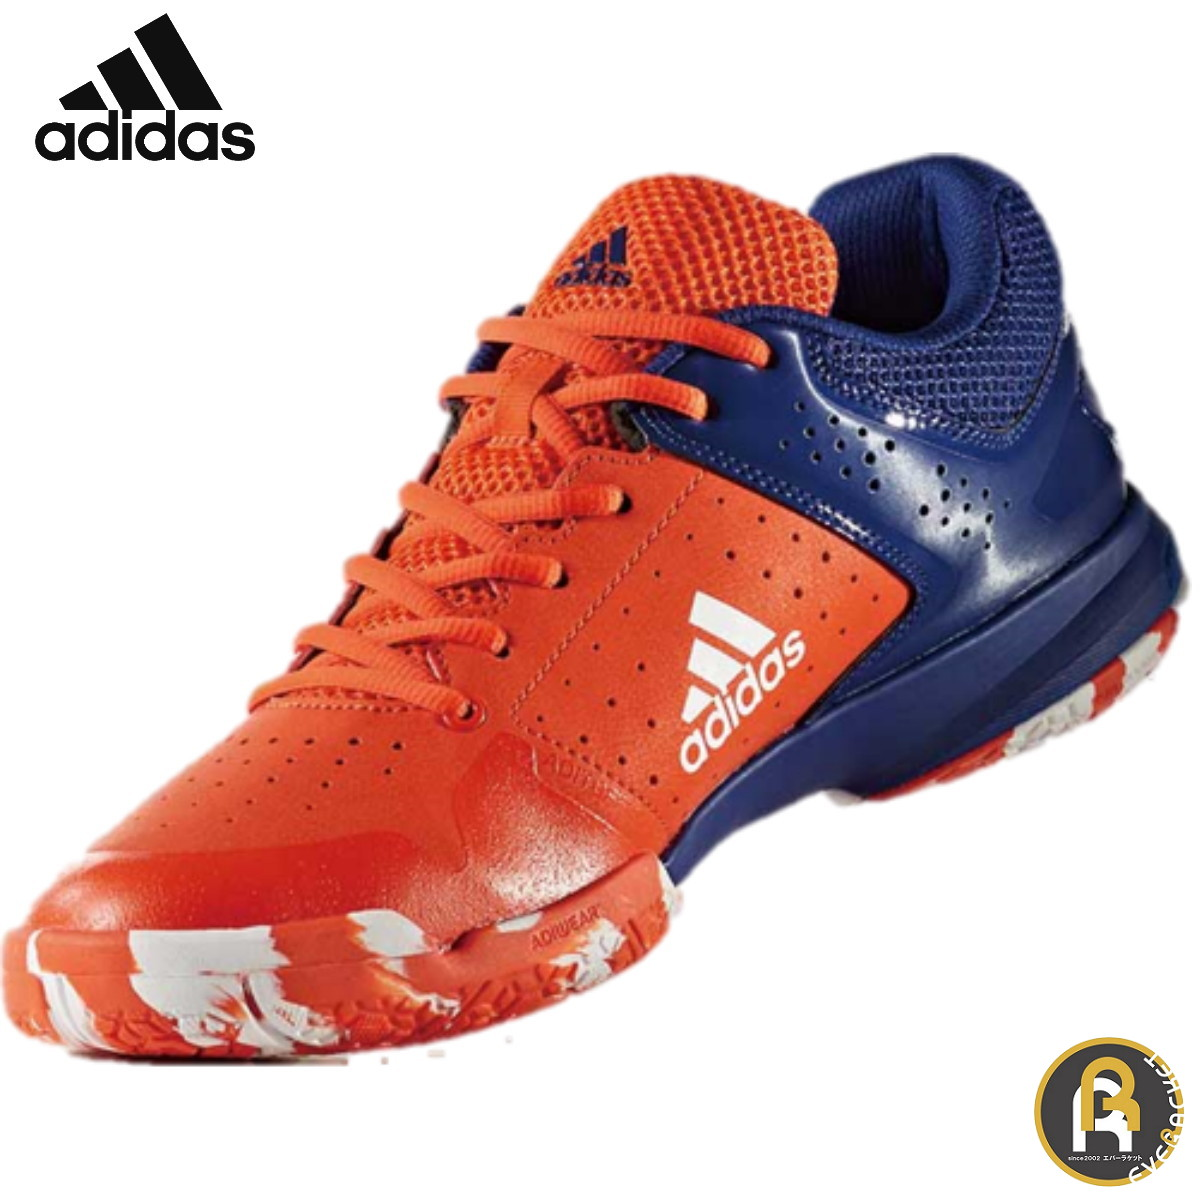 adidas アディダススリービー ラケットスポーツジャパン バドミントン バドミントンシューズ クイックフォース5.1 BY1818